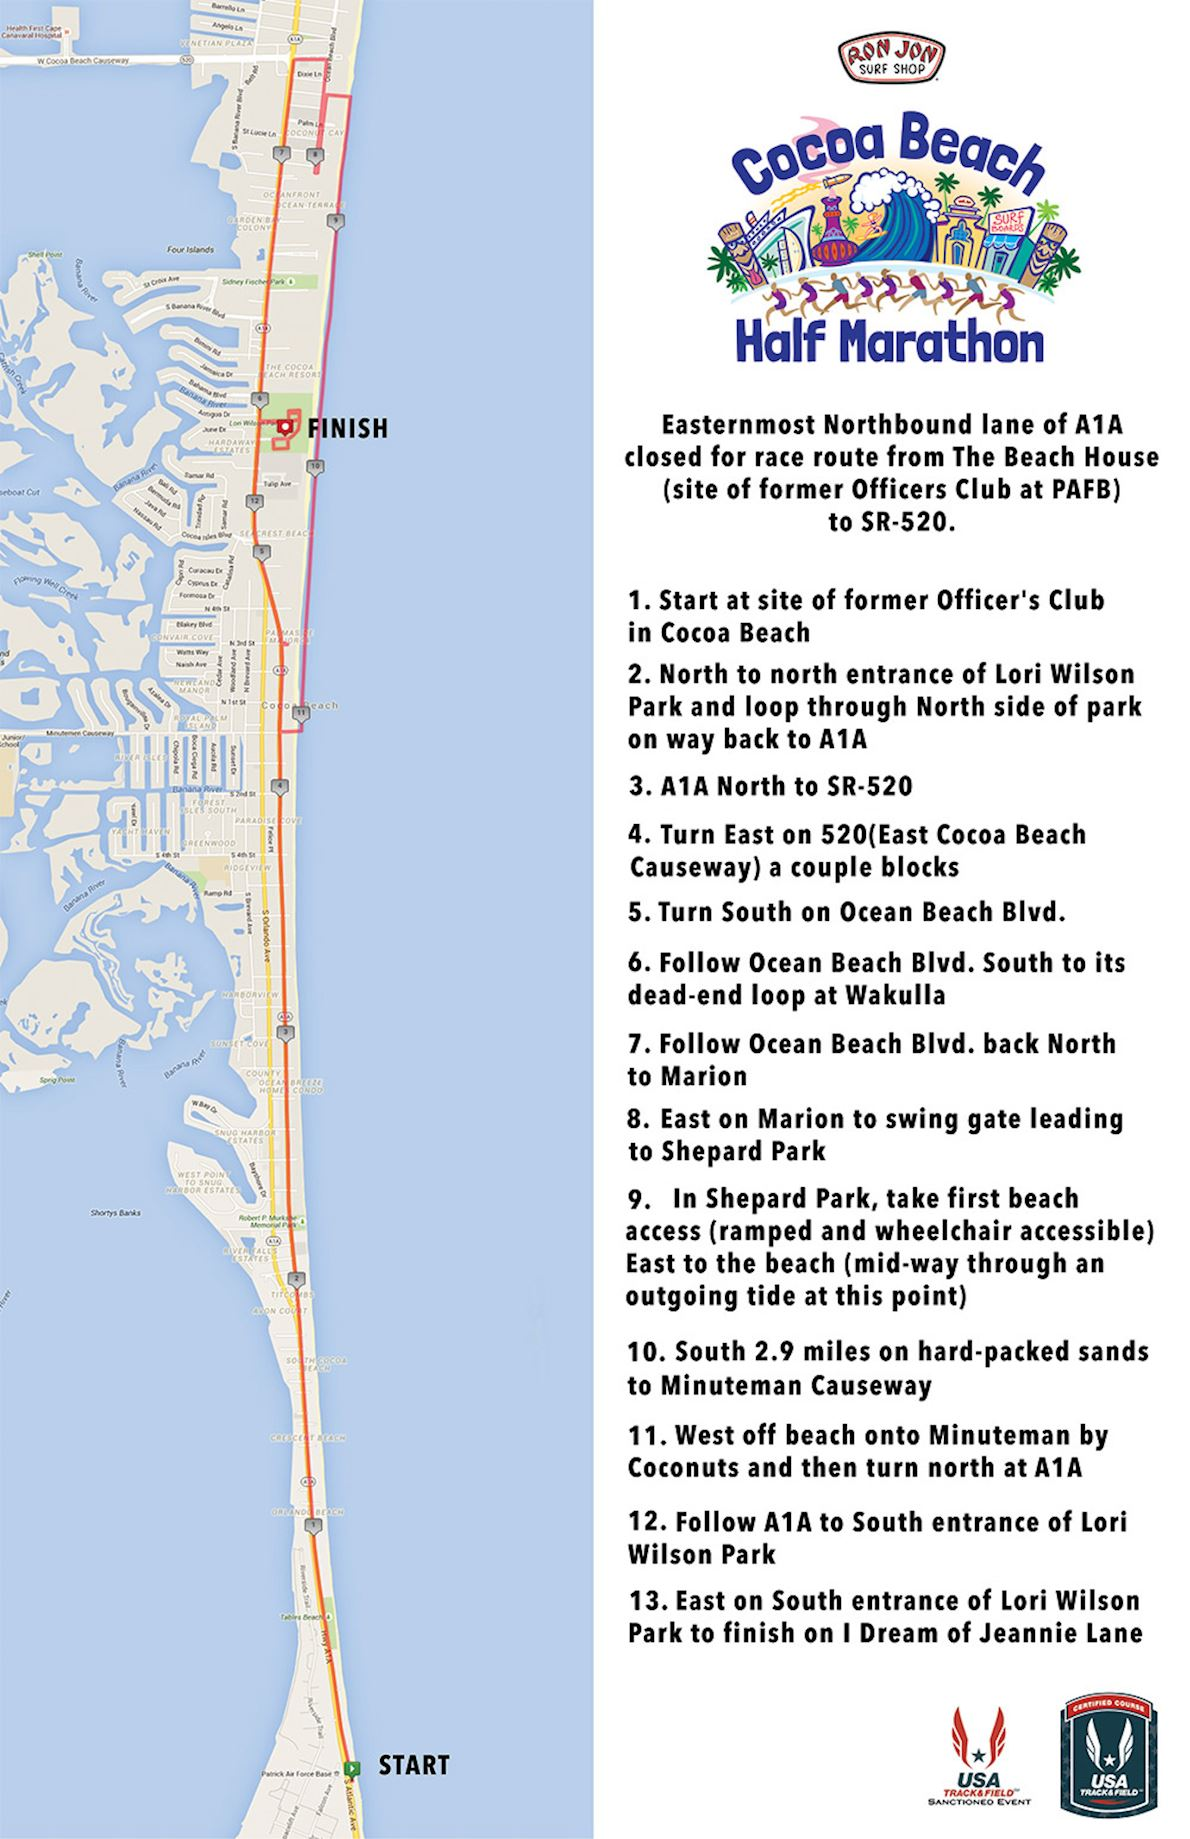 Cocoa Beach Half Marathon 路线图